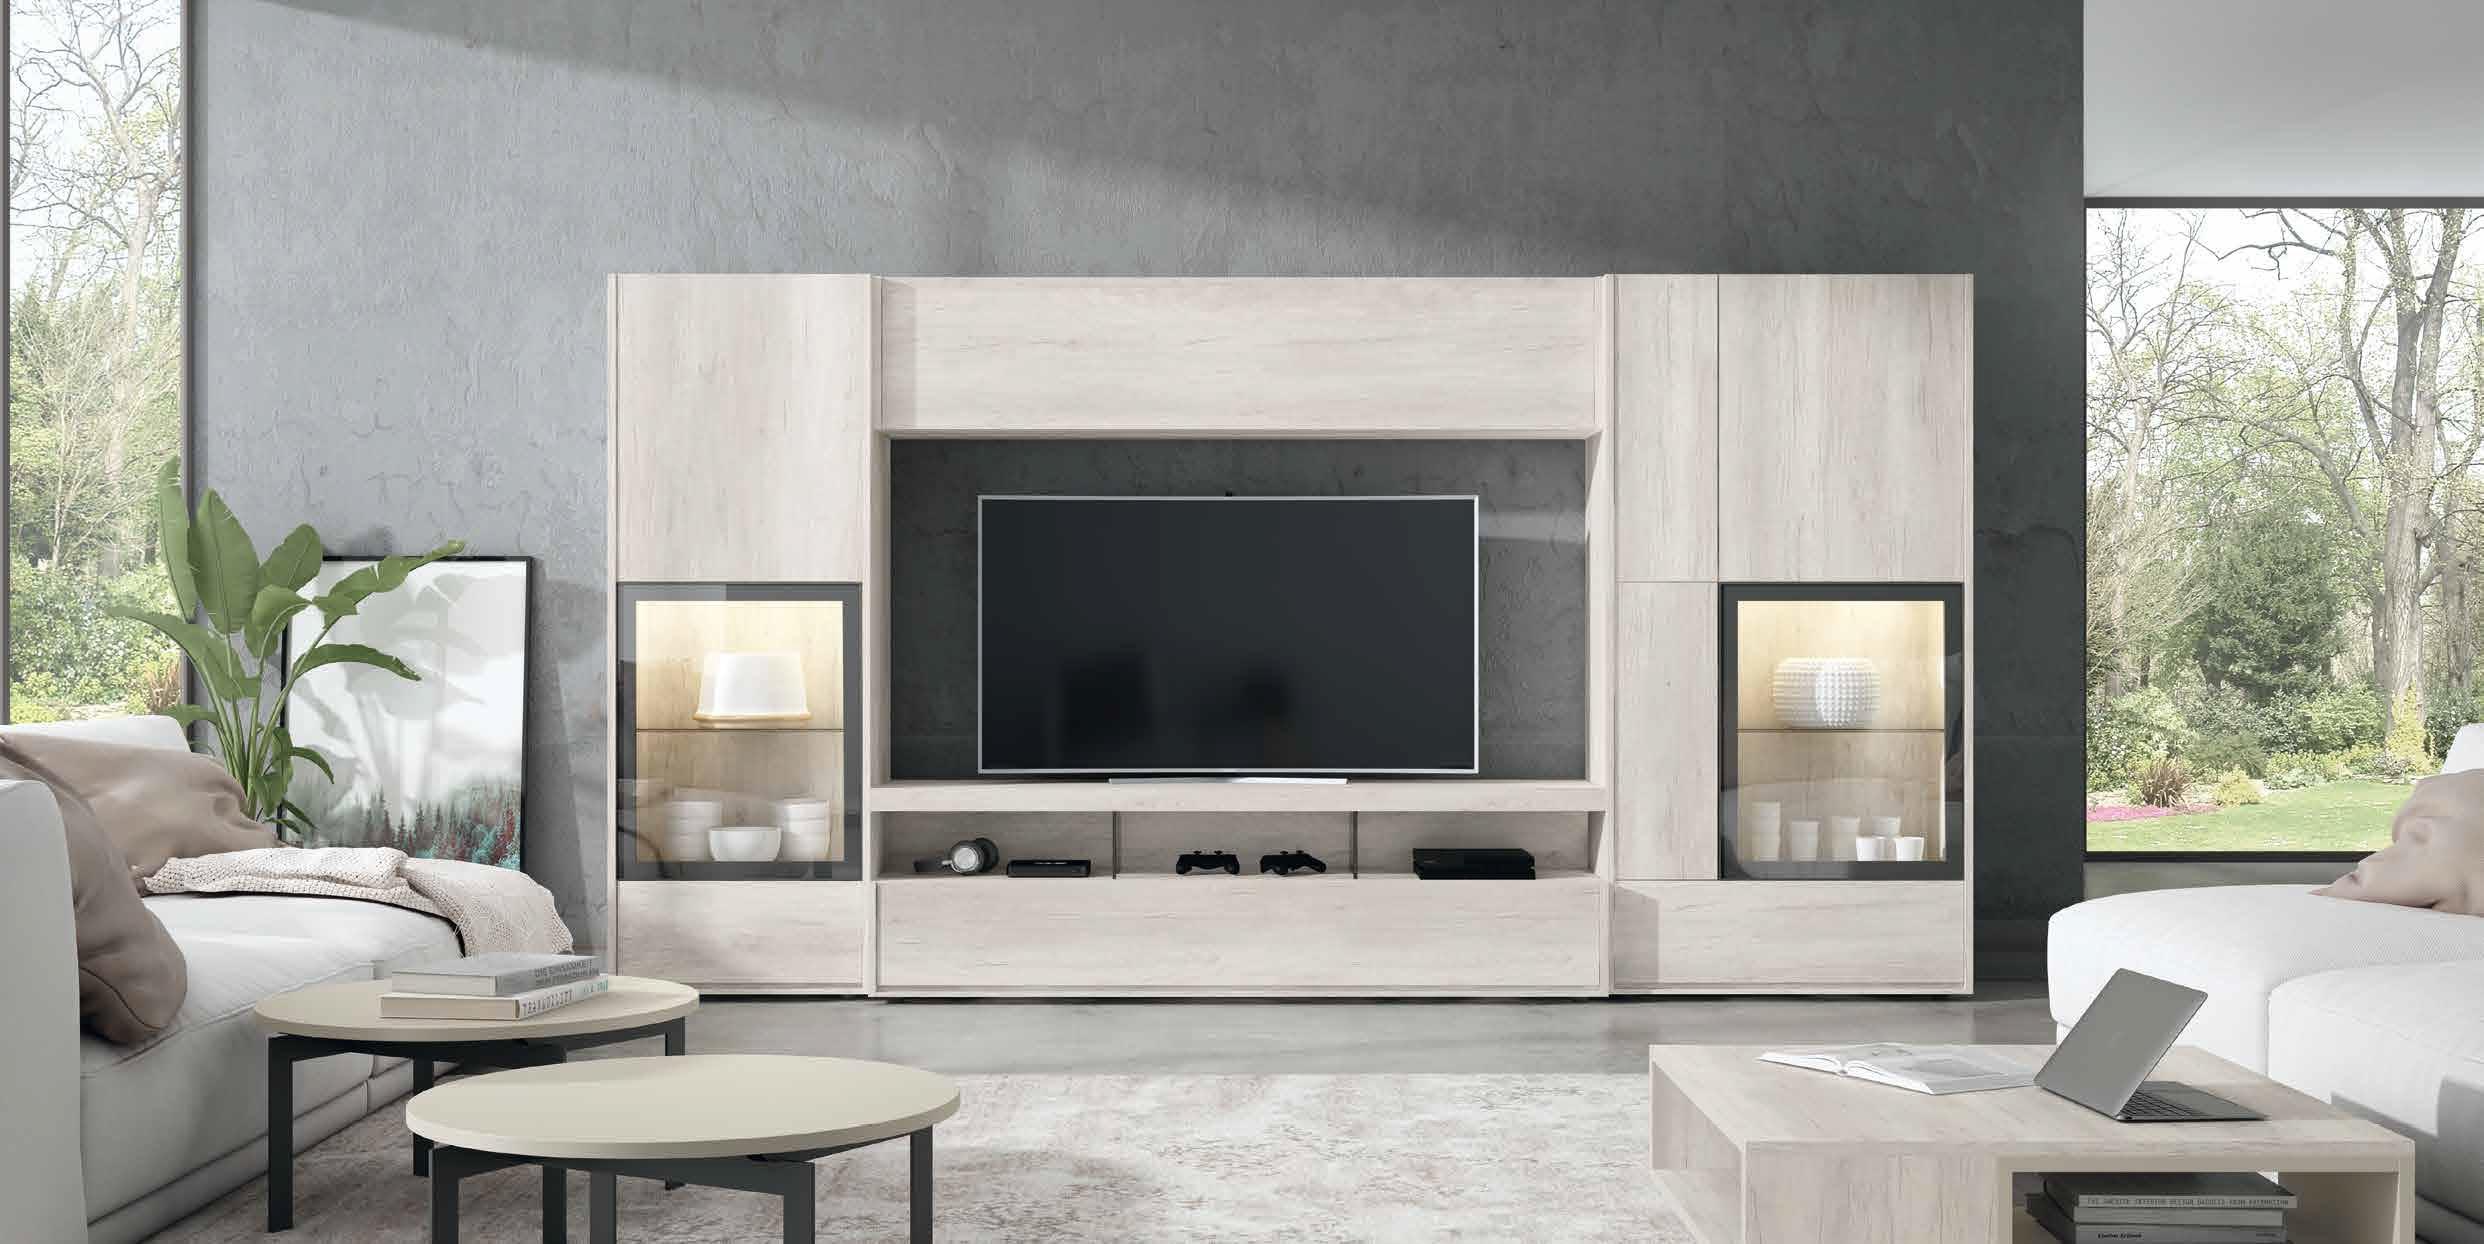 salon-moderno-Nativ-2019-muebles-paco-caballero-0920-5c8ceabee748e